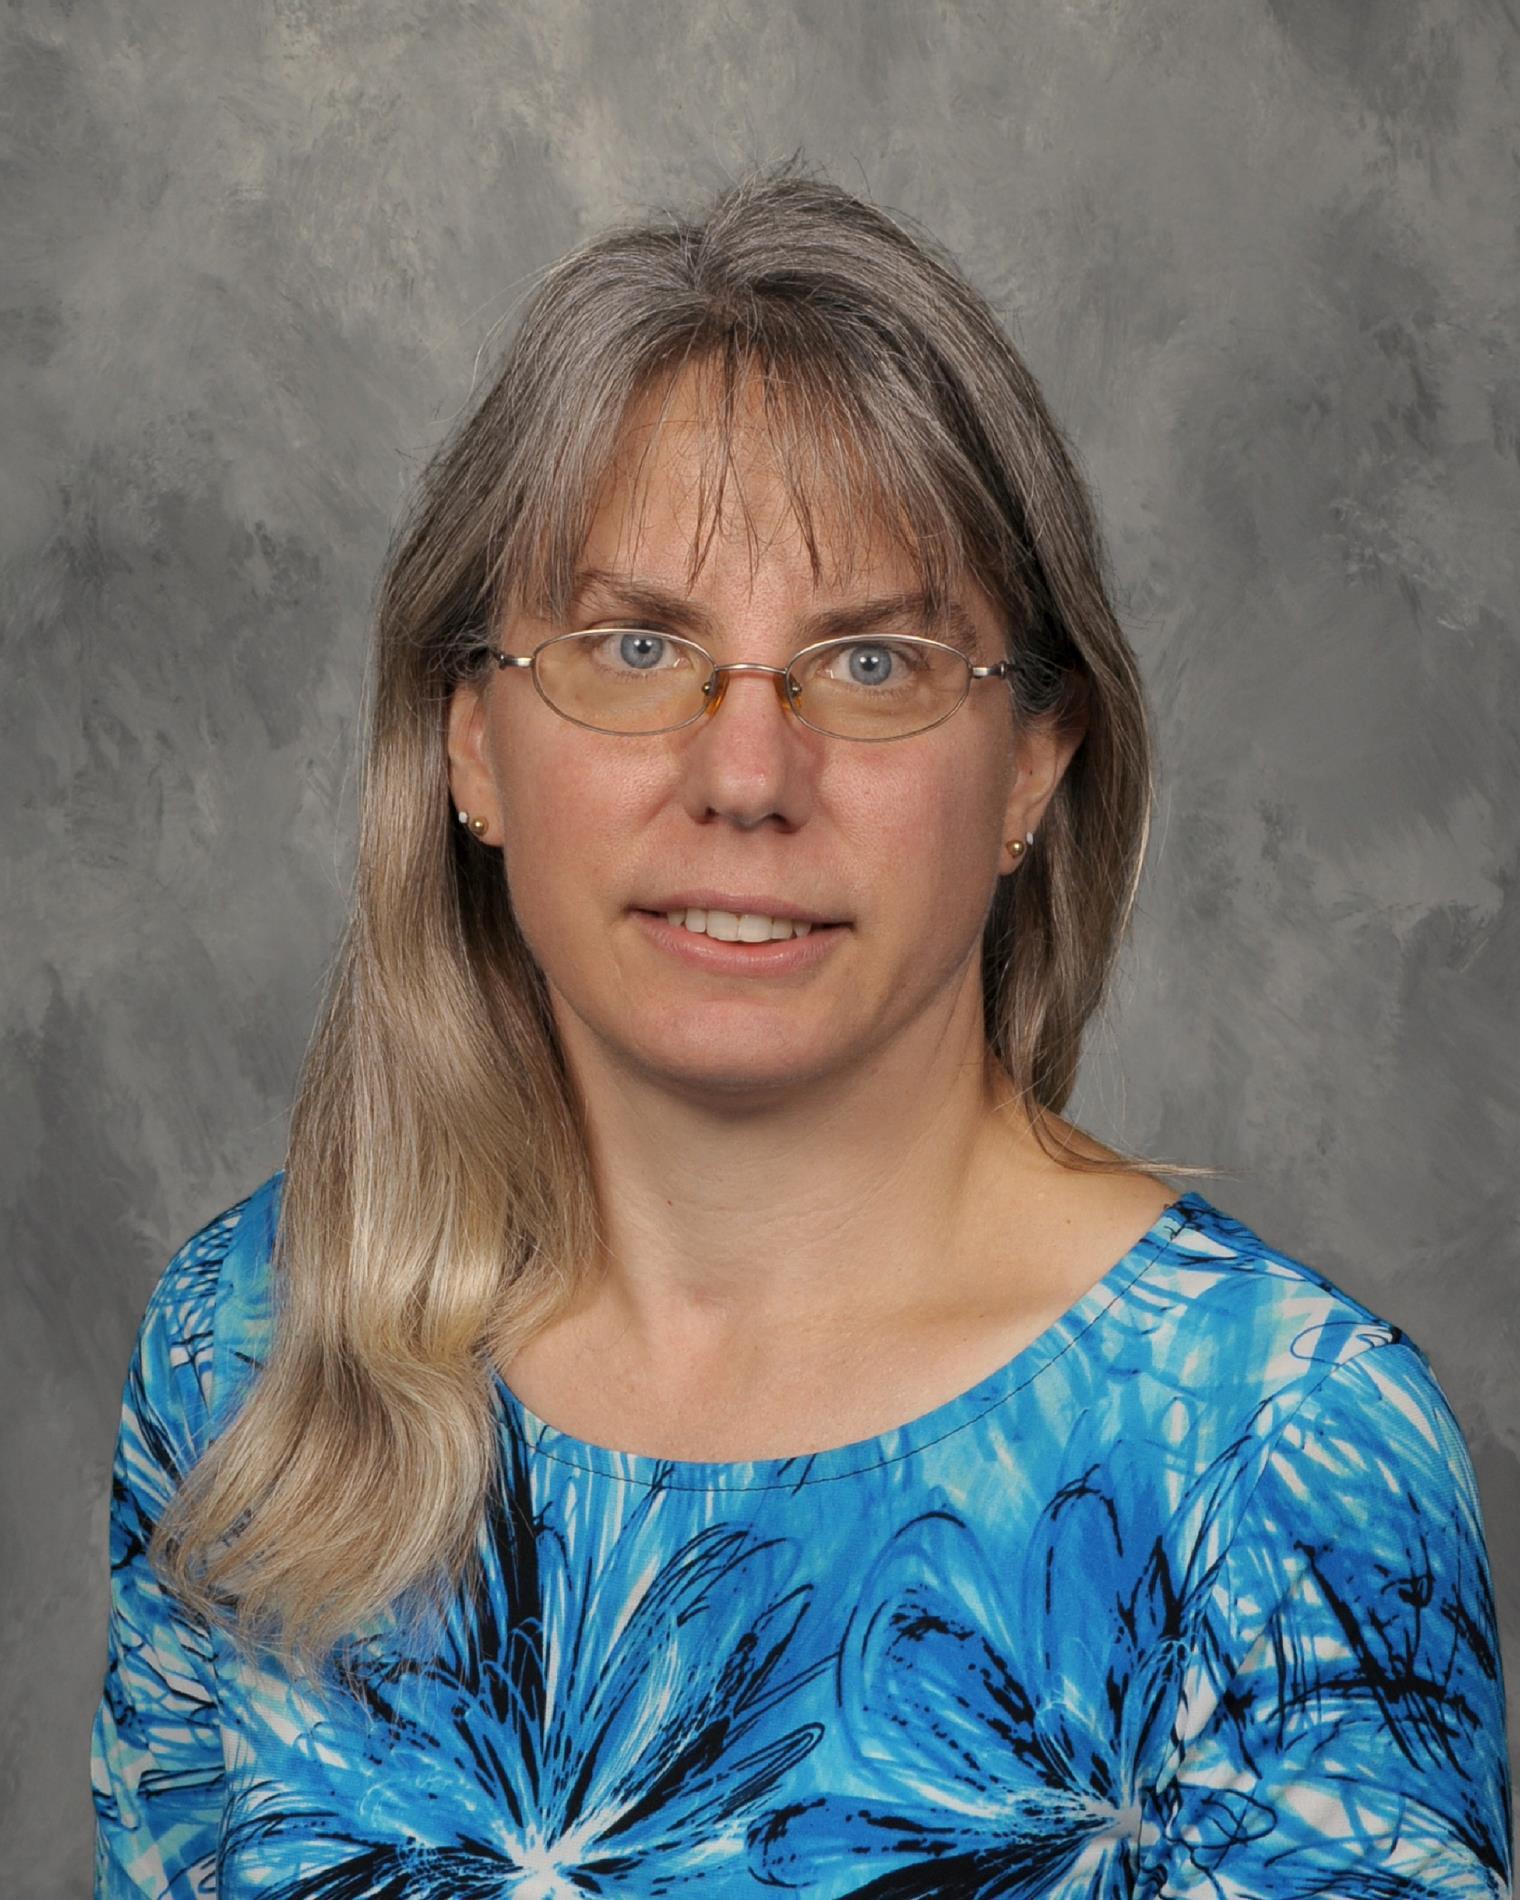 Mrs. (Laurel) Hemon